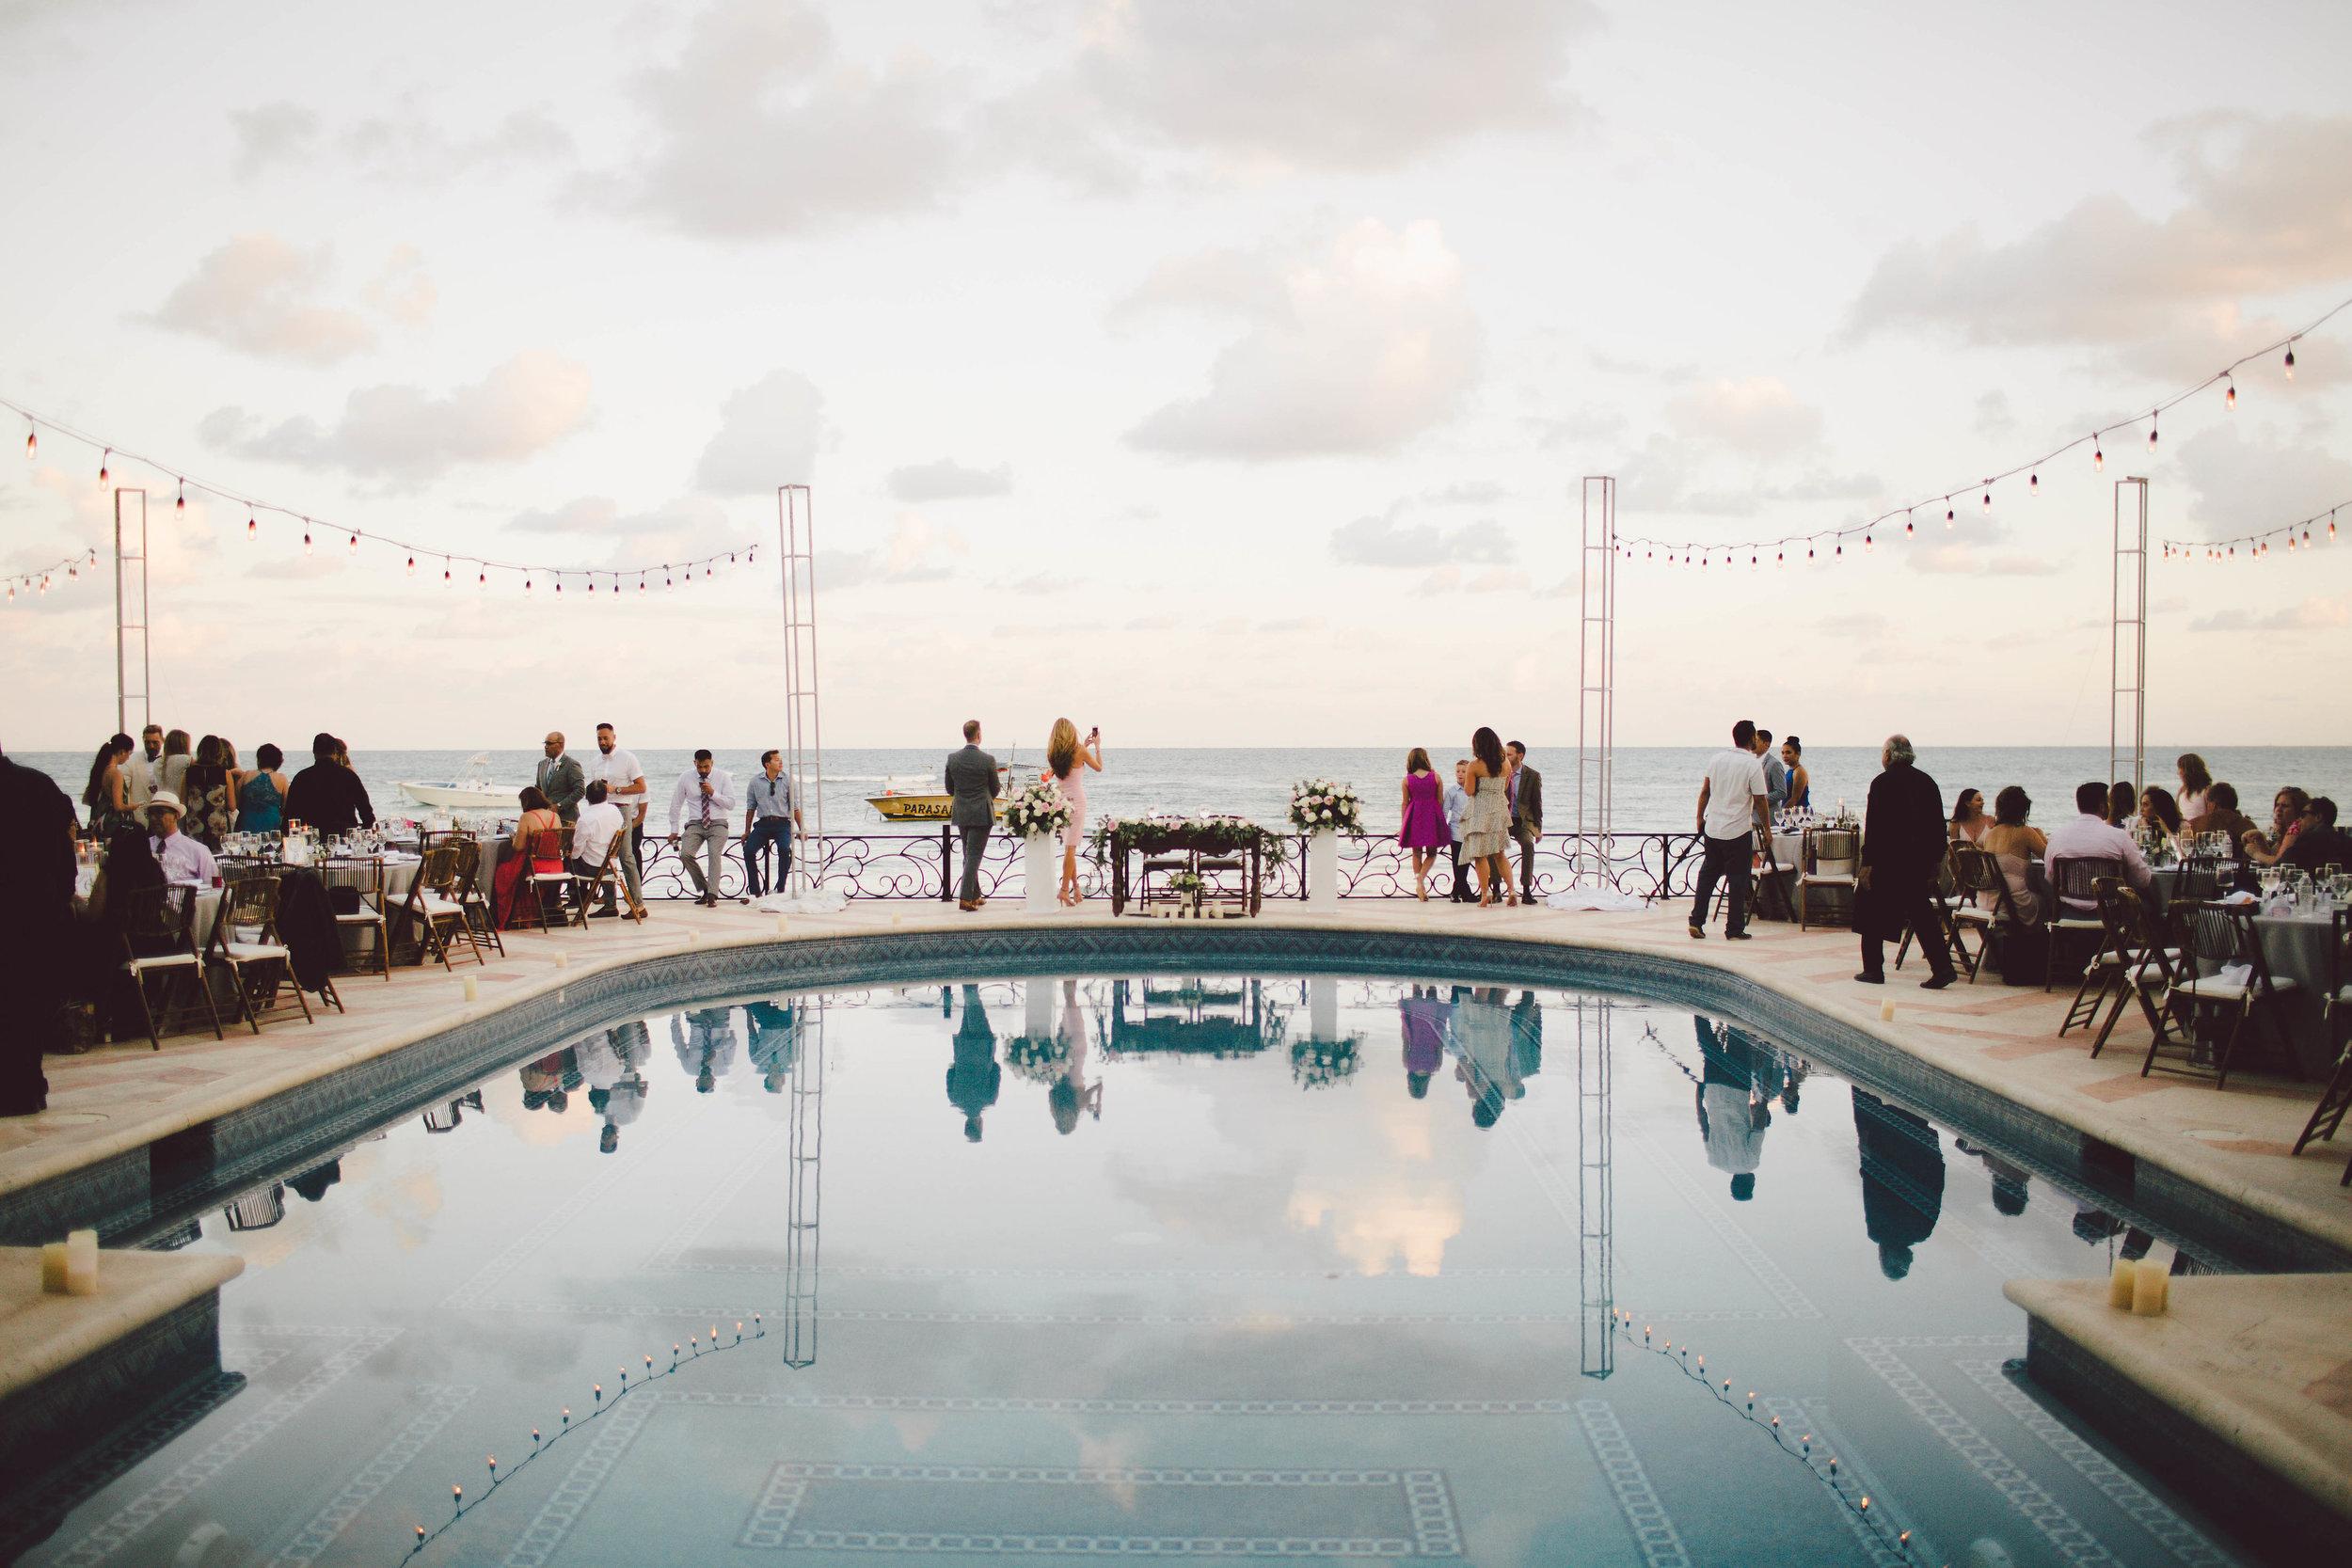 mexico_wedding_cancun_villa_la_joya_evangeline_lane_116.jpg